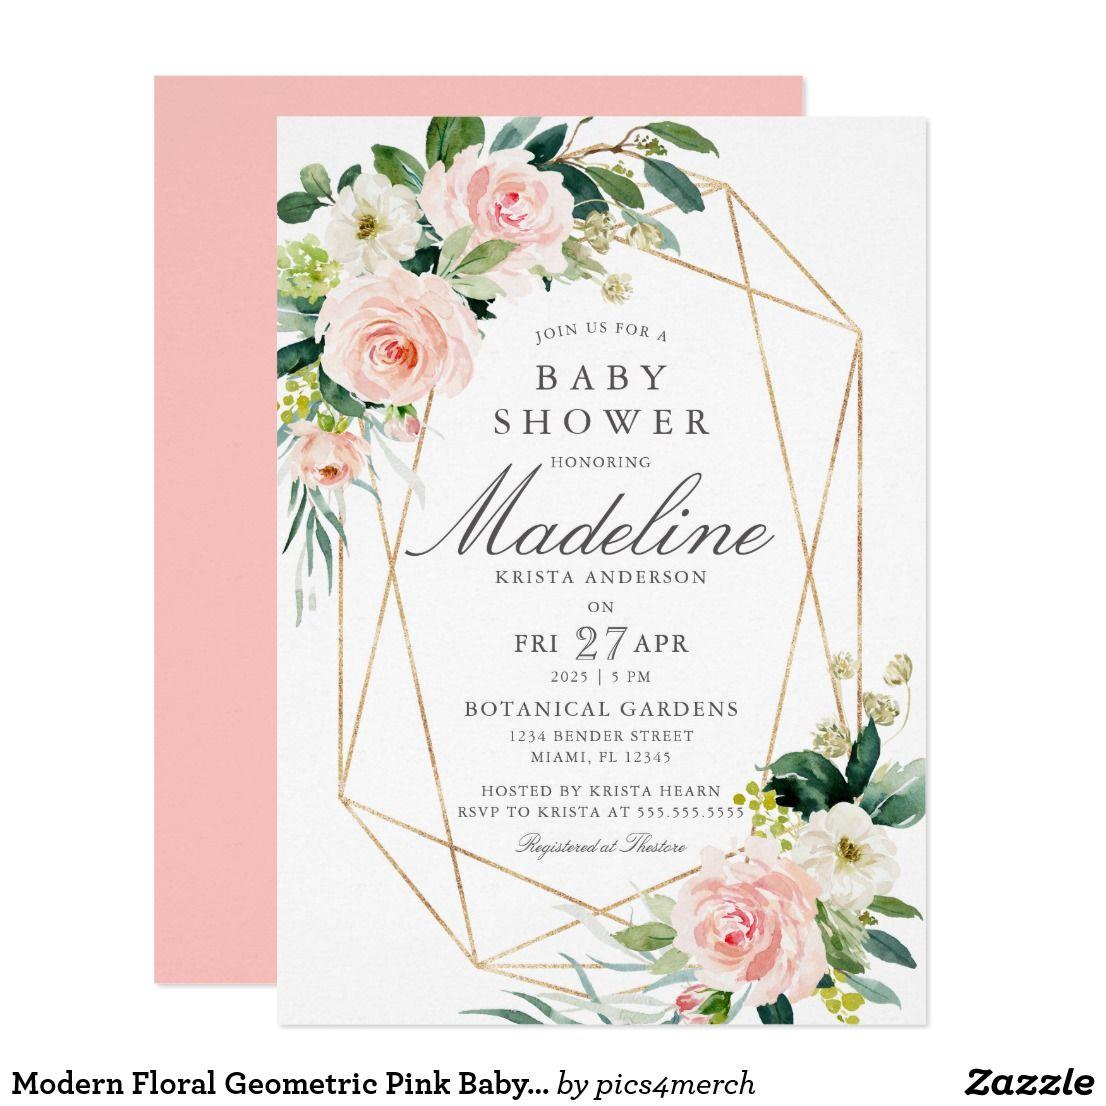 Modern Floral Geometric Pink Baby Shower Invitation Zazzle